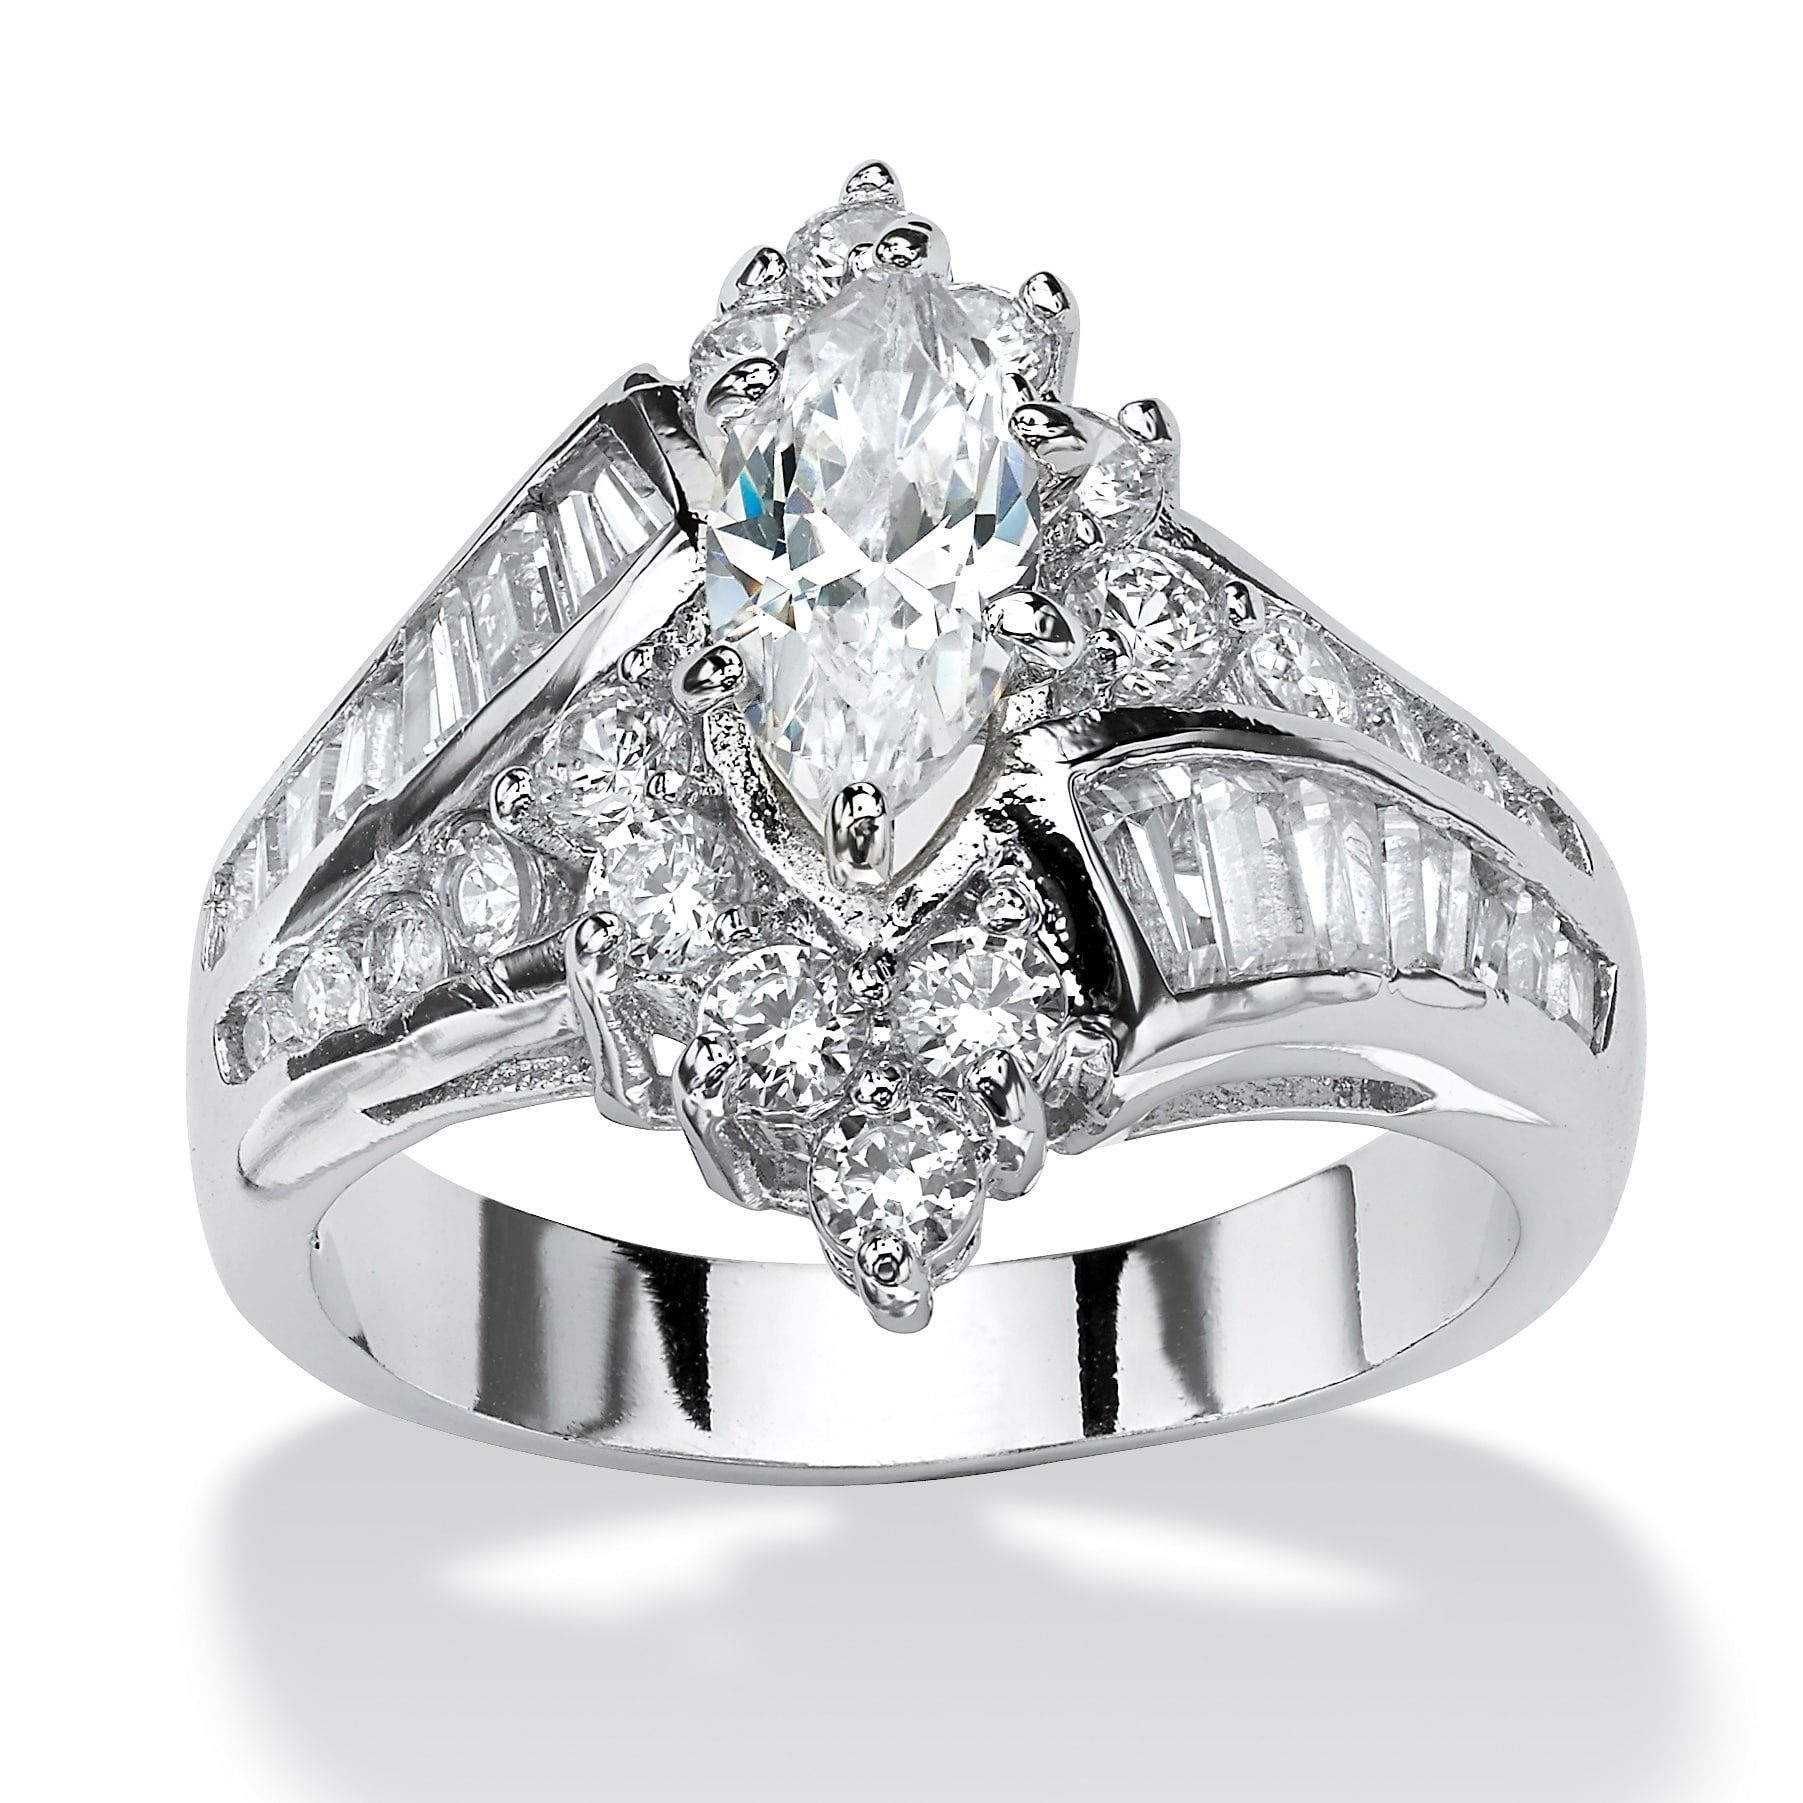 Platinumplated Cubic Zirconia Engagement Ring White